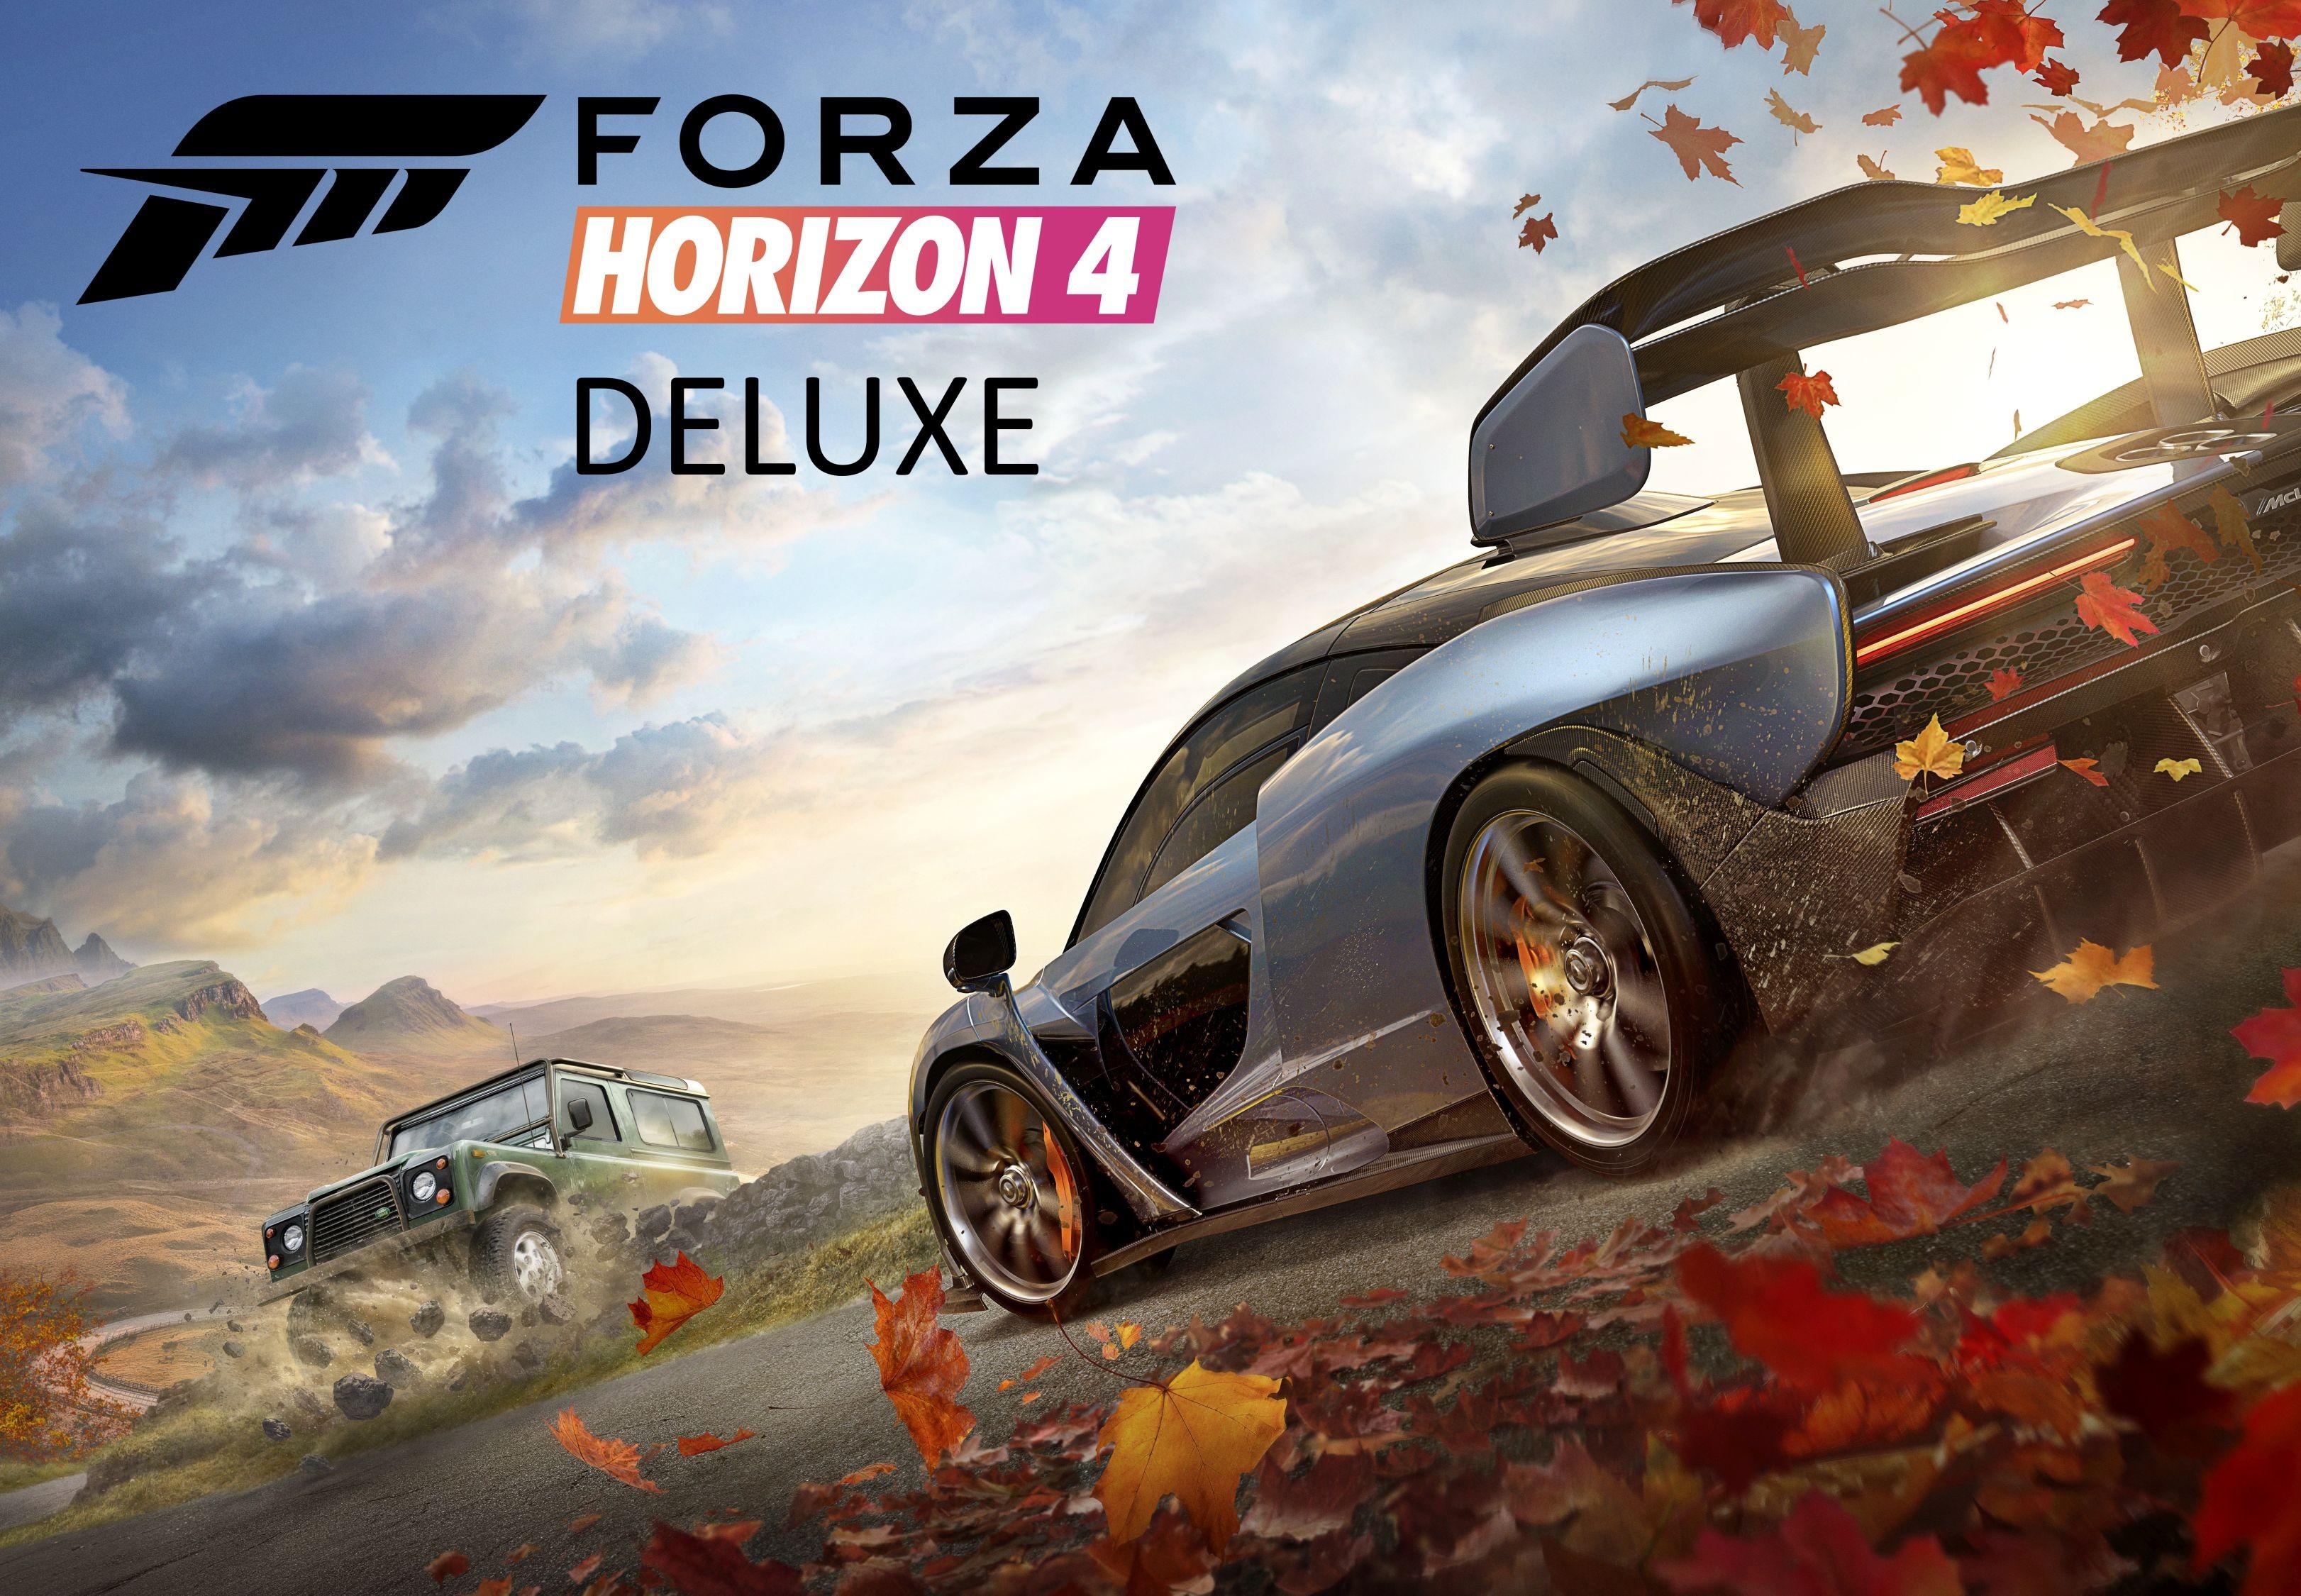 Forza Horizon 4 Deluxe Edition EU XBOX One / Windows 10 CD KEY